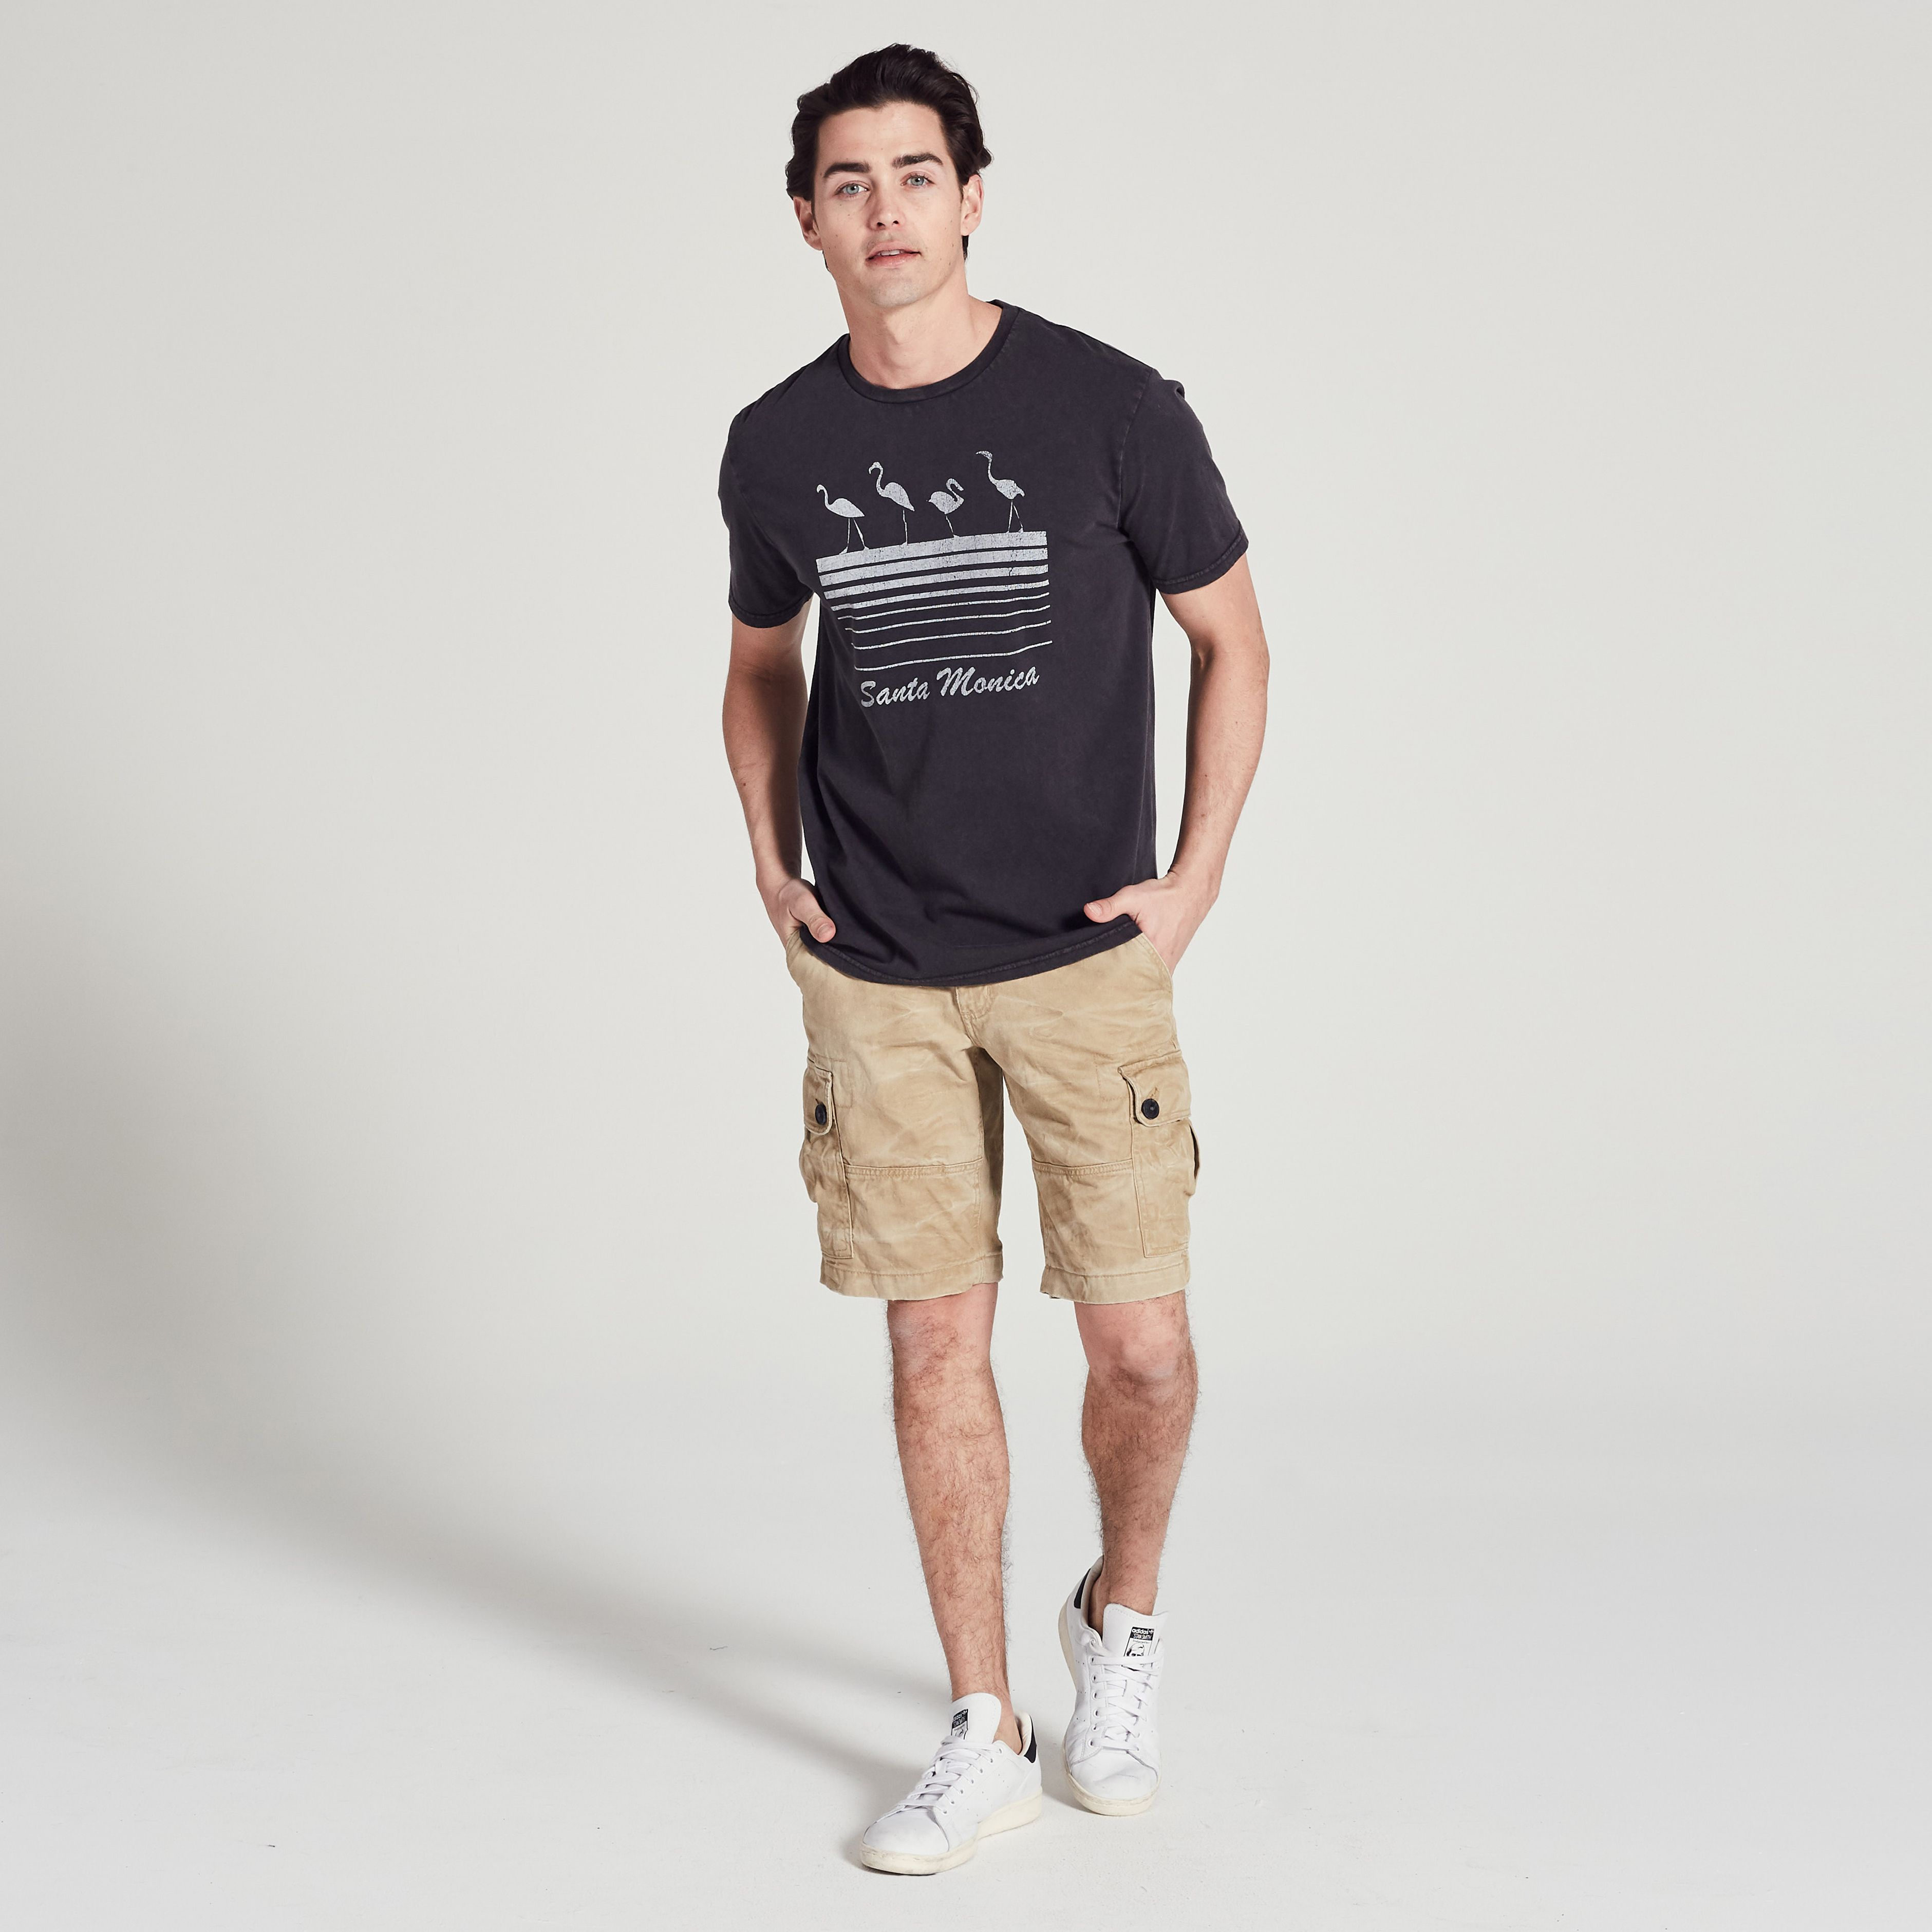 992bfd230b Mens Swim Shirt Kmart | Toffee Art